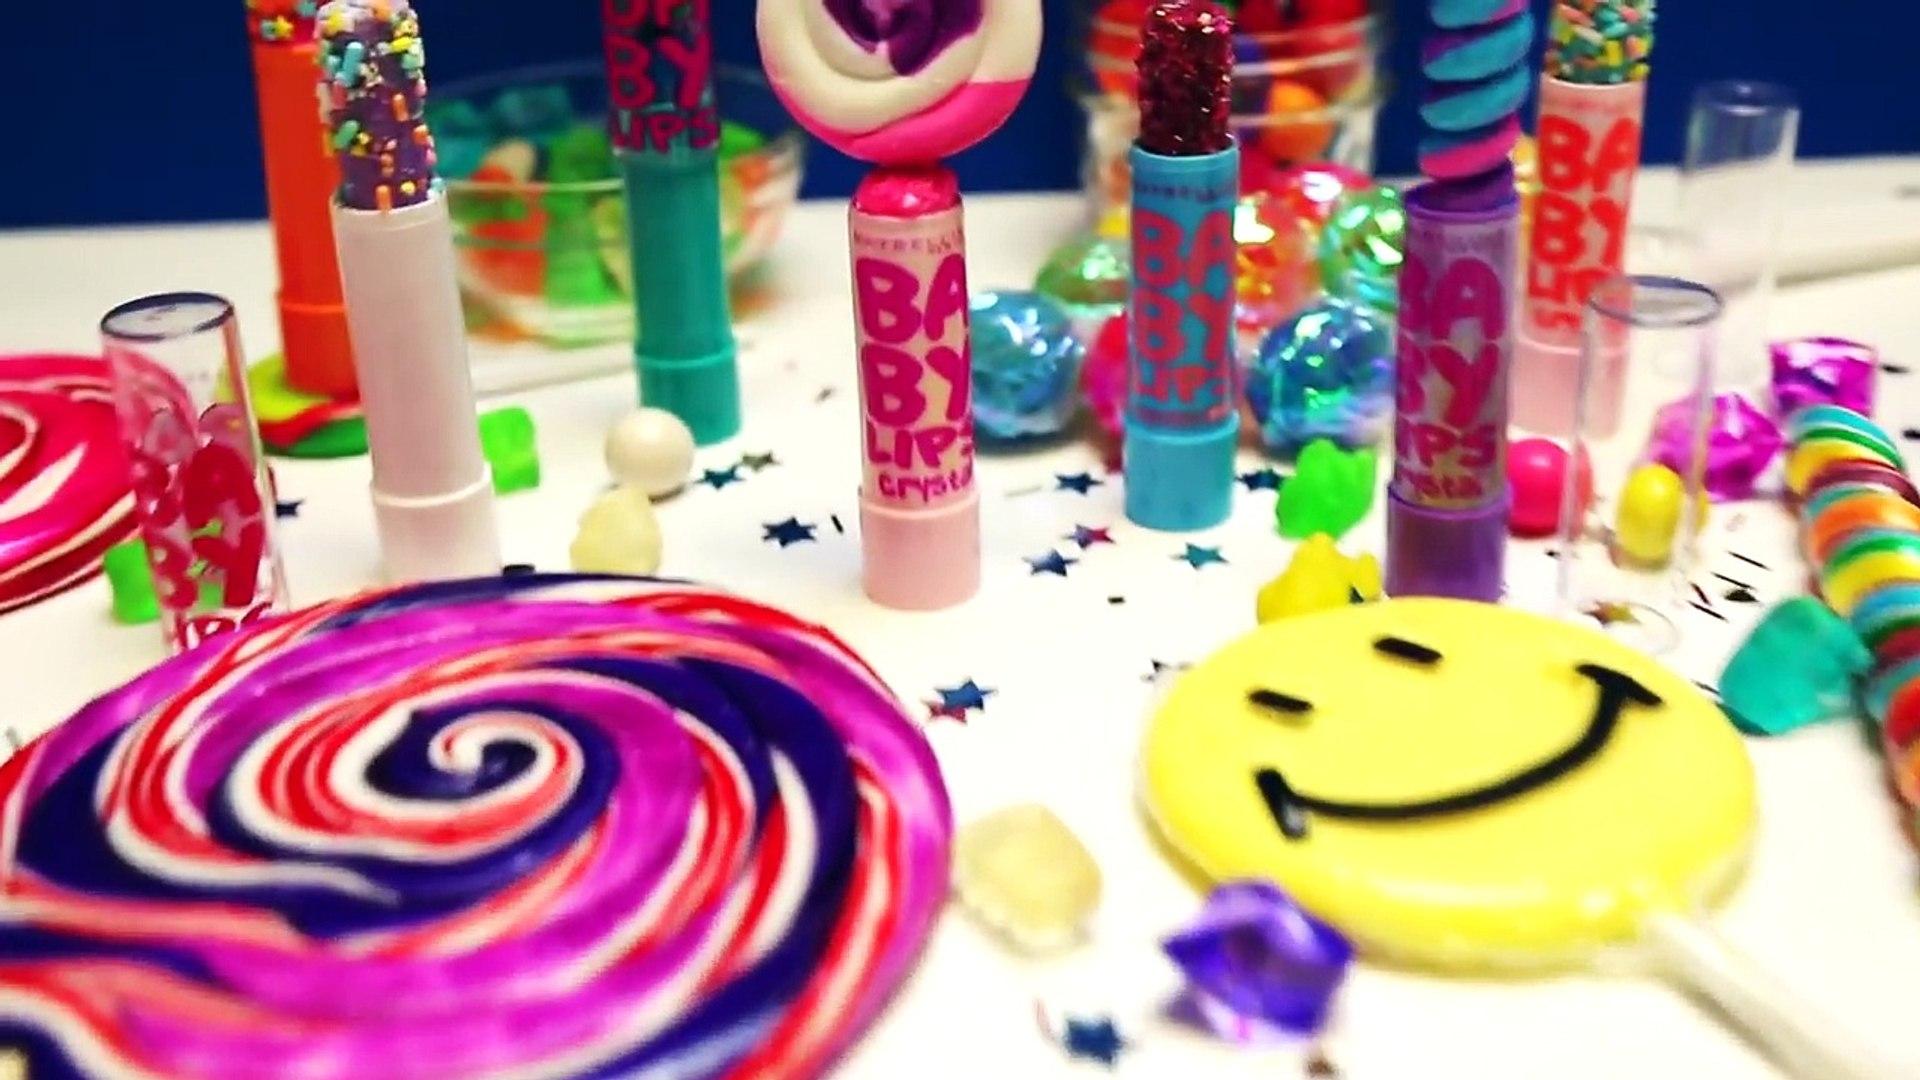 DIY Crafts: Baby Lips Lip Balm Phone Charger - DIYs Real Lip Balm & Charger - Cool DIY Tut